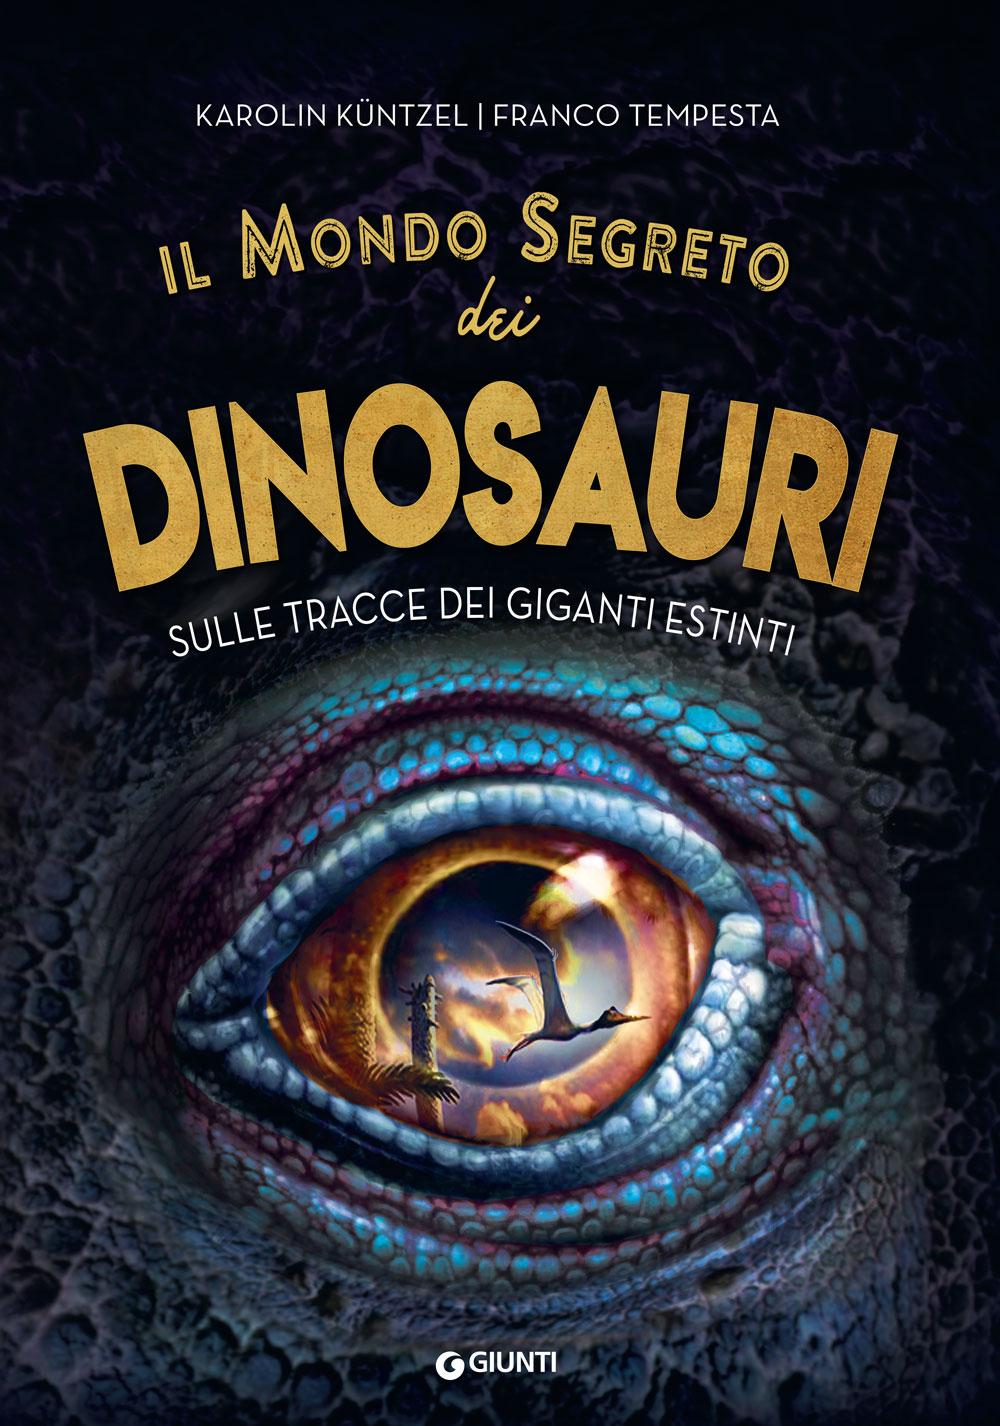 Il mondo segreto dei dinosauri